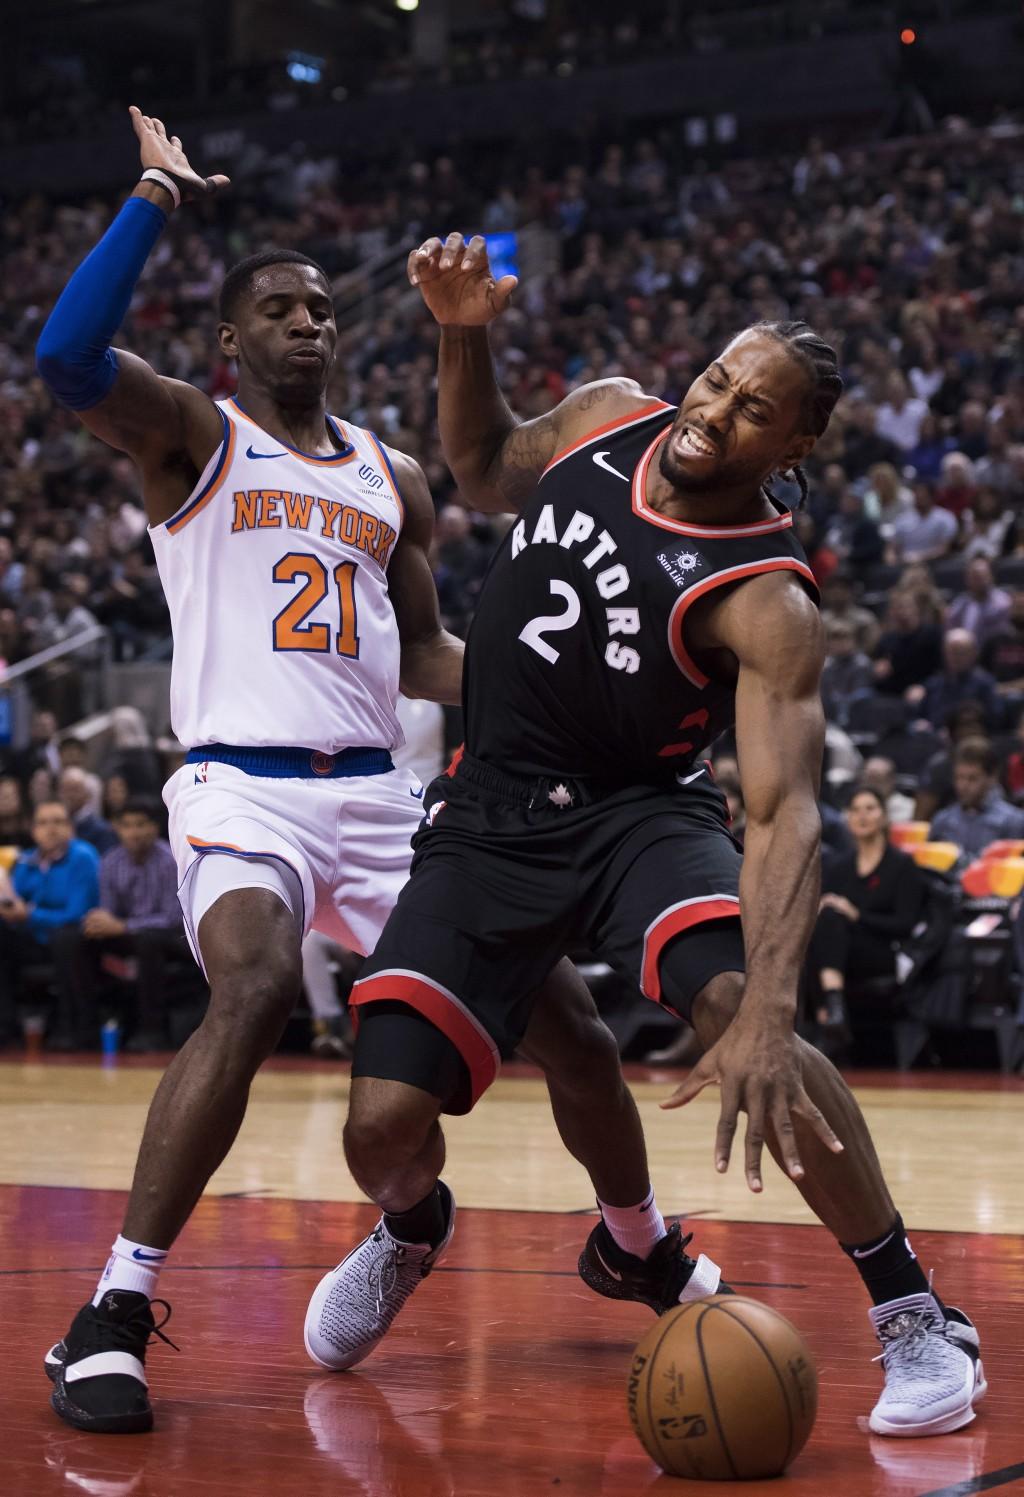 Toronto Raptors forward Kawhi Leonard (2) battles for the ball against New York Knicks guard Damyean Dotson (21) during first half NBA basketball acti